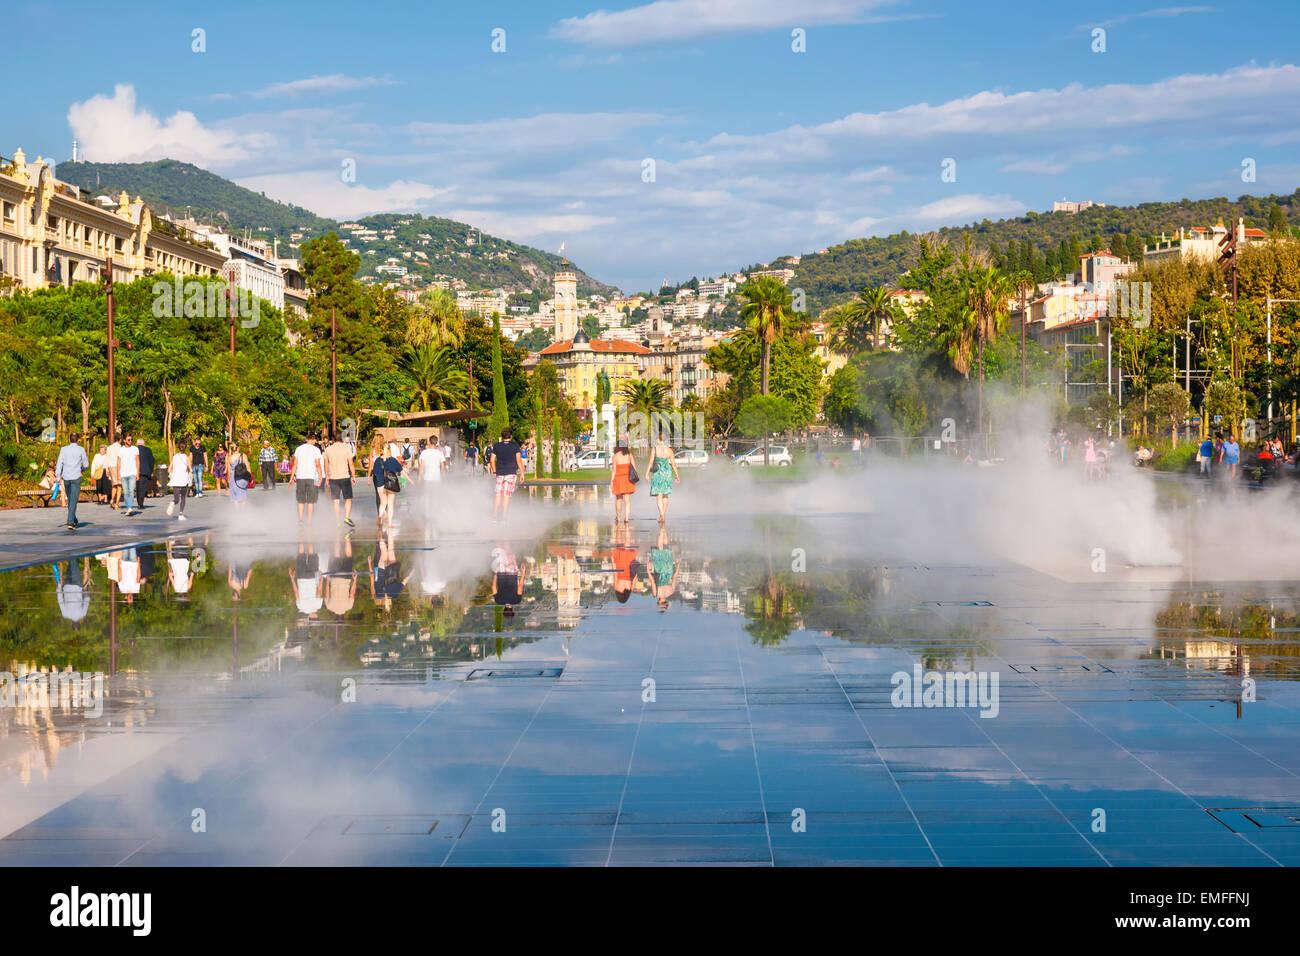 NICE, FRANCE - OCTOBER 2, 2014: People walking through soaking fountain on Promenade du Paillon reflecting the city Stock Photo